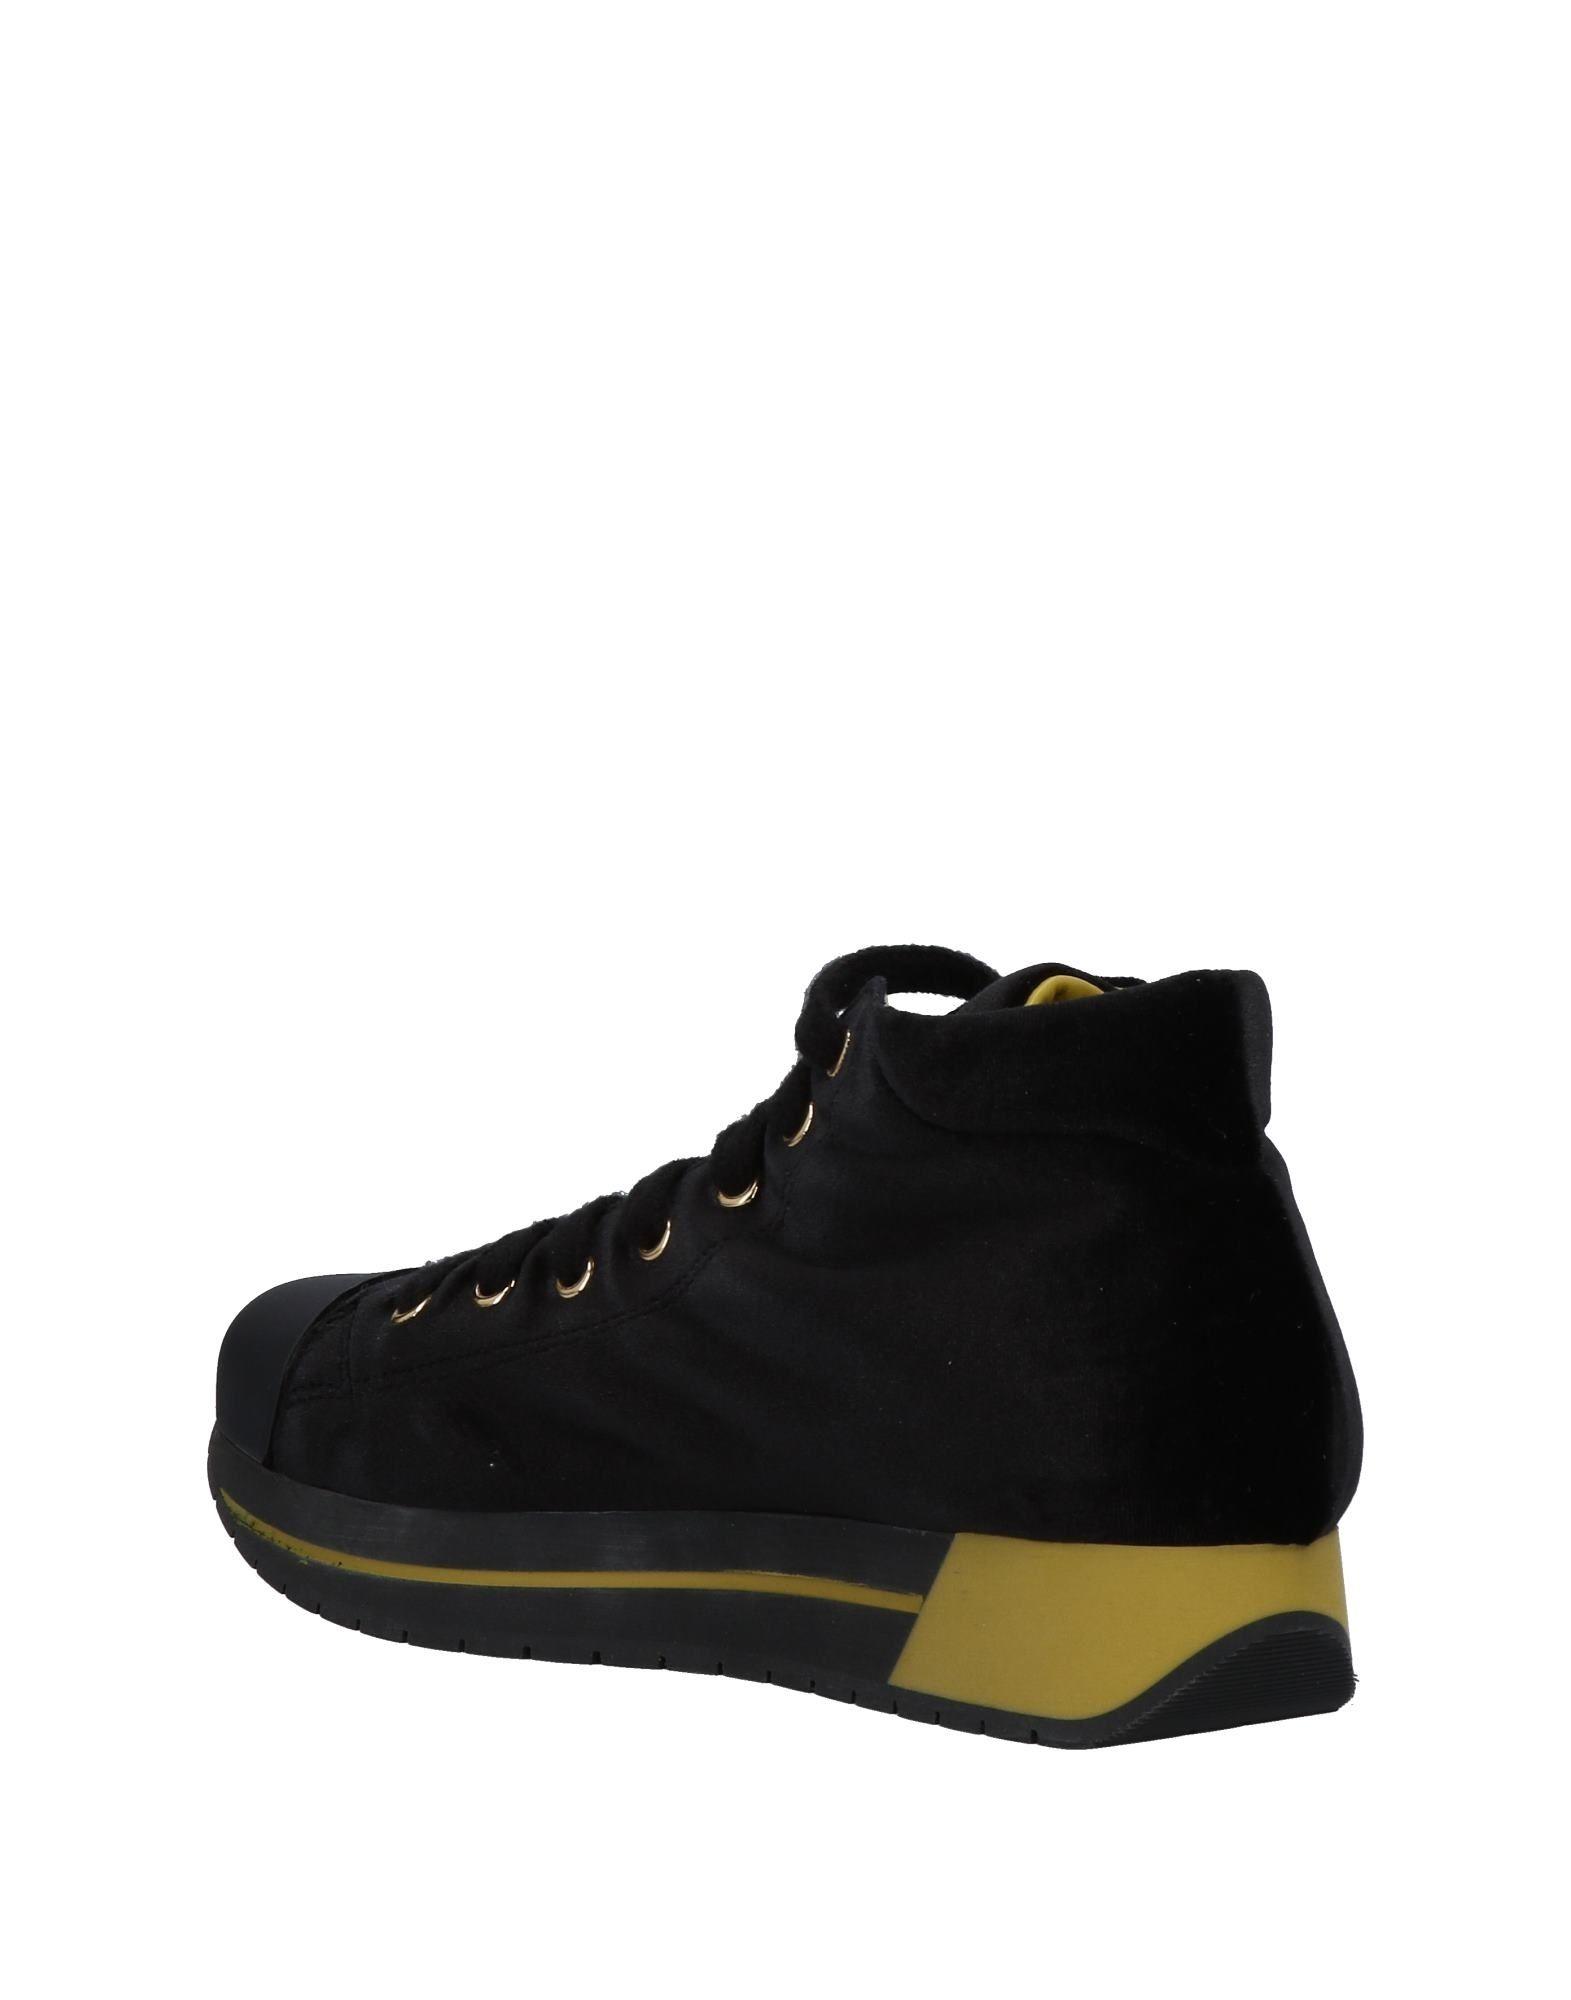 Officine Marini Gute Sneakers Damen  11473007DX Gute Marini Qualität beliebte Schuhe 132740